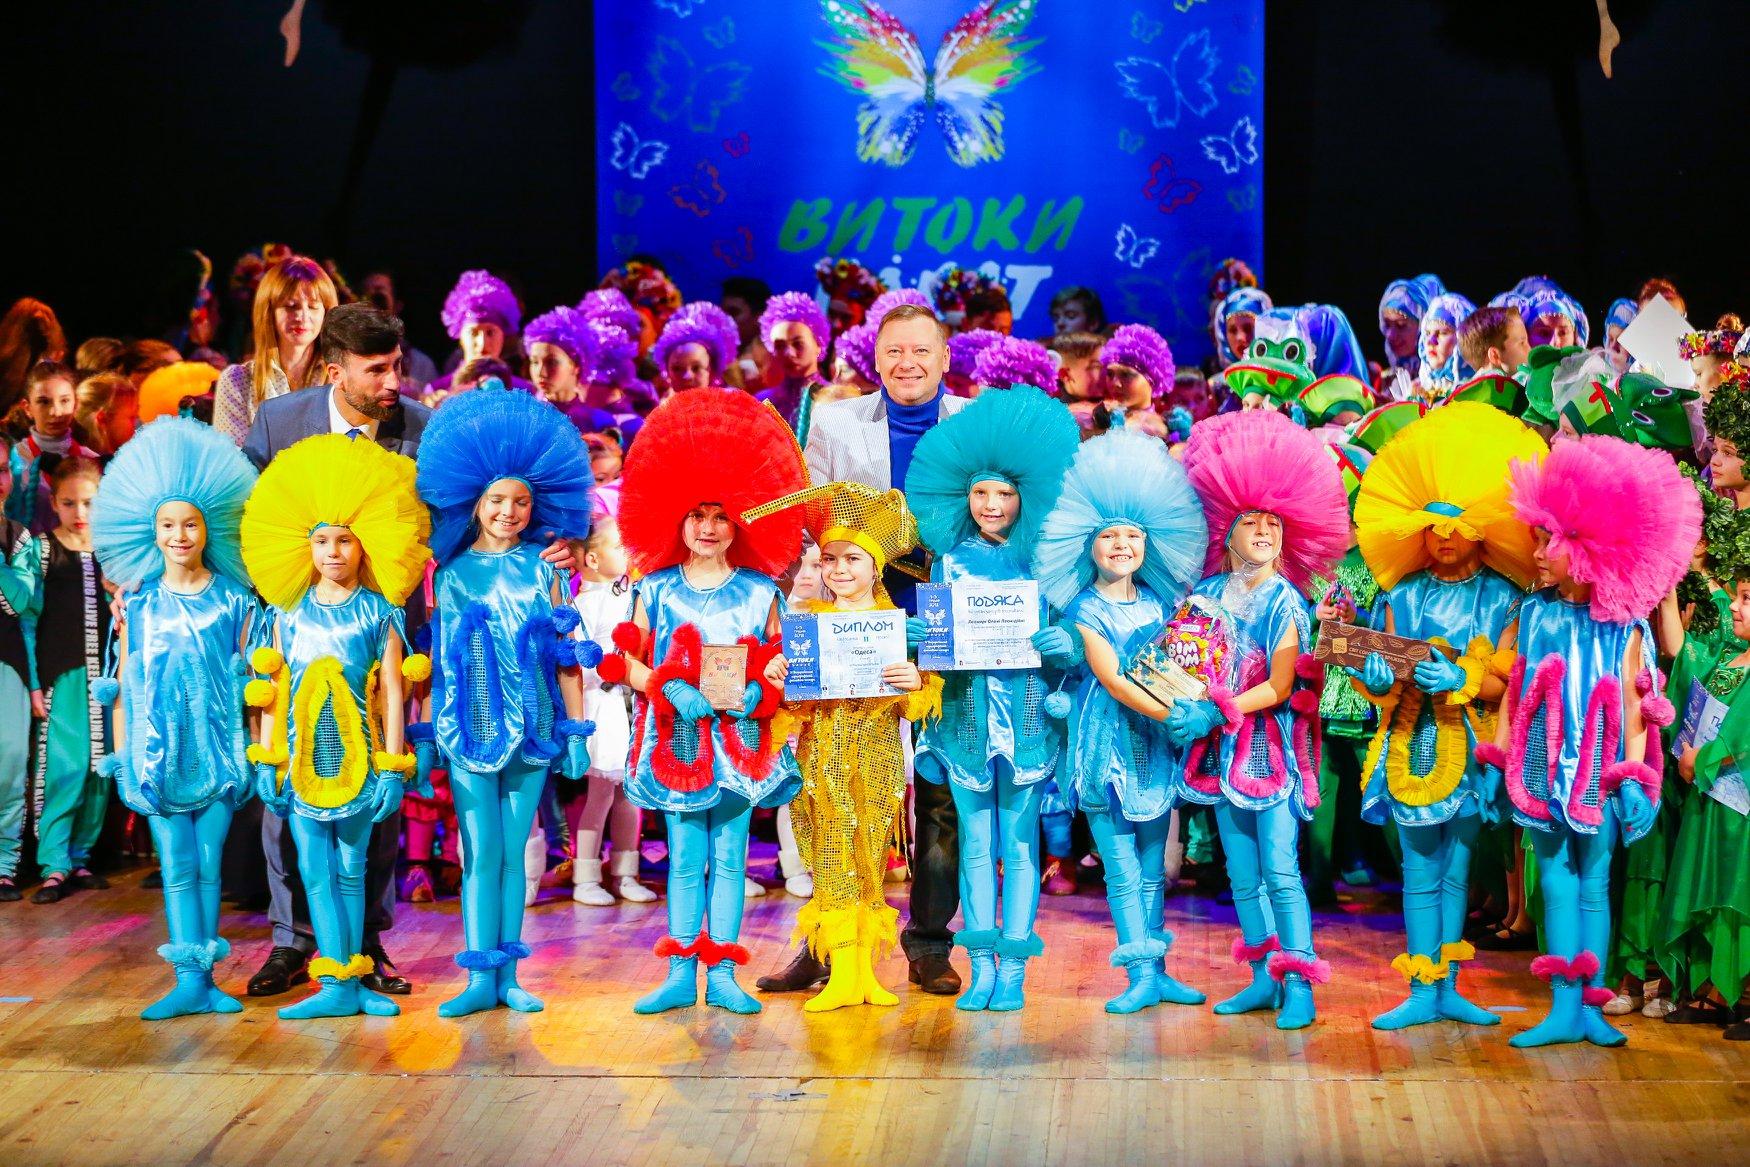 Витоки-Dance 2018 г. Одесса